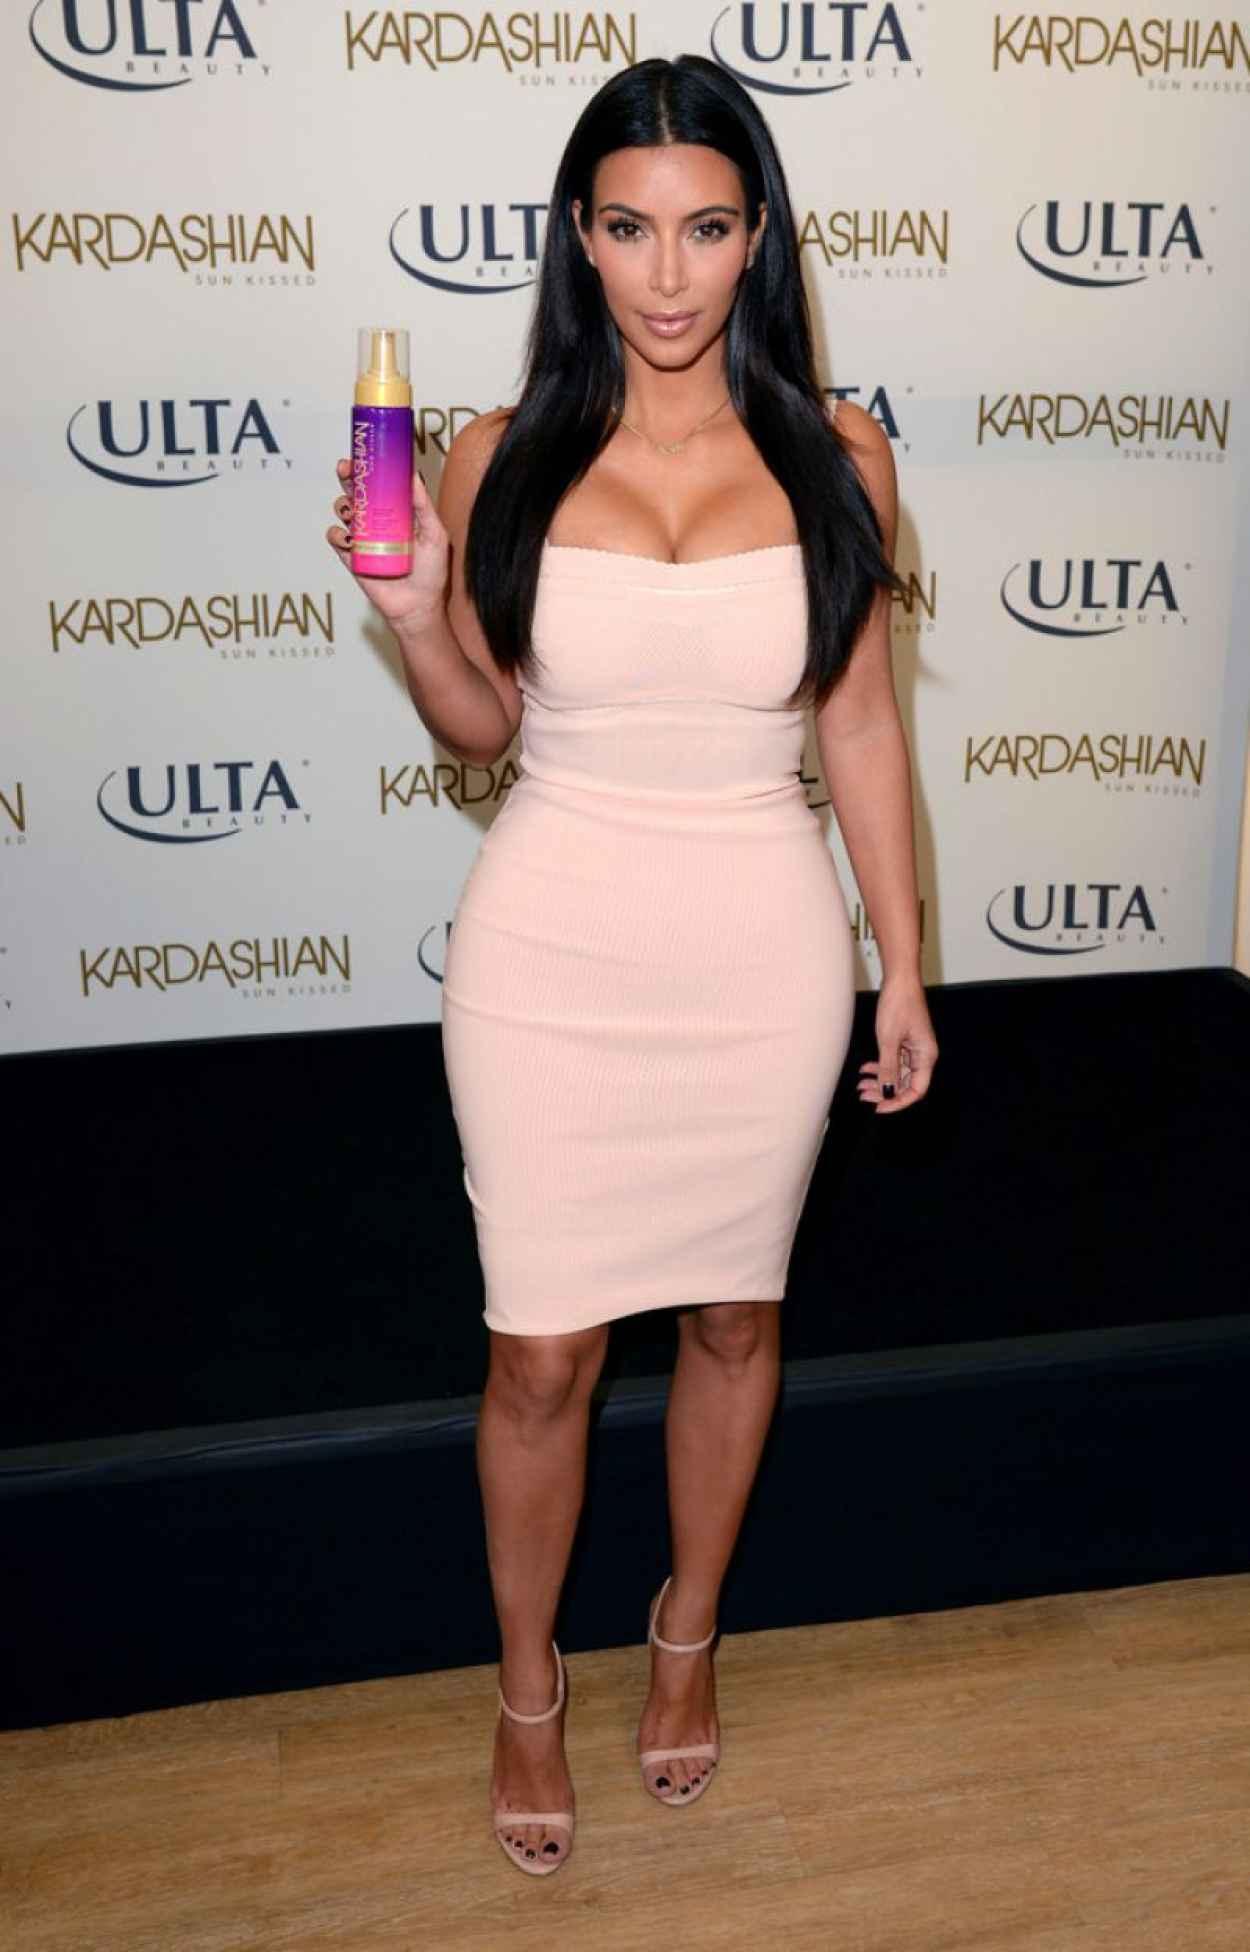 Kim Kardashian: Kardashian Sun Kissed Promo Event -05